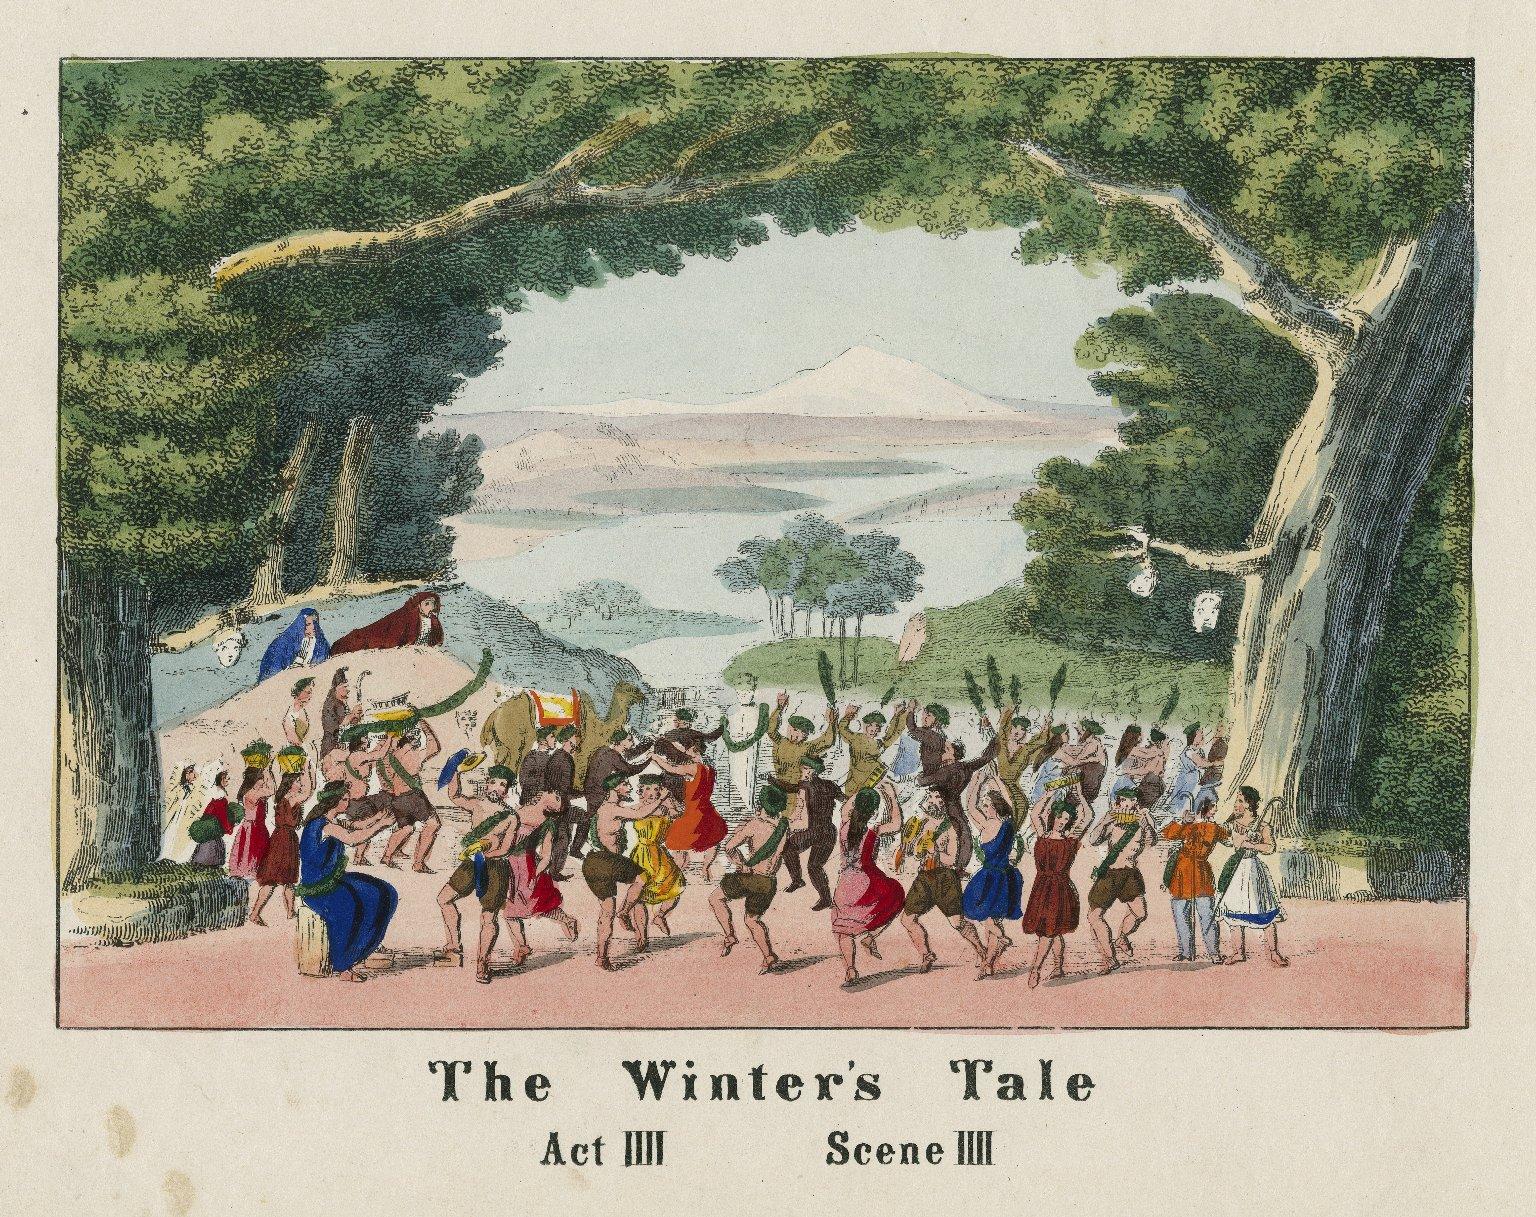 Winter's tale, act IIII, scene IIII [graphic].